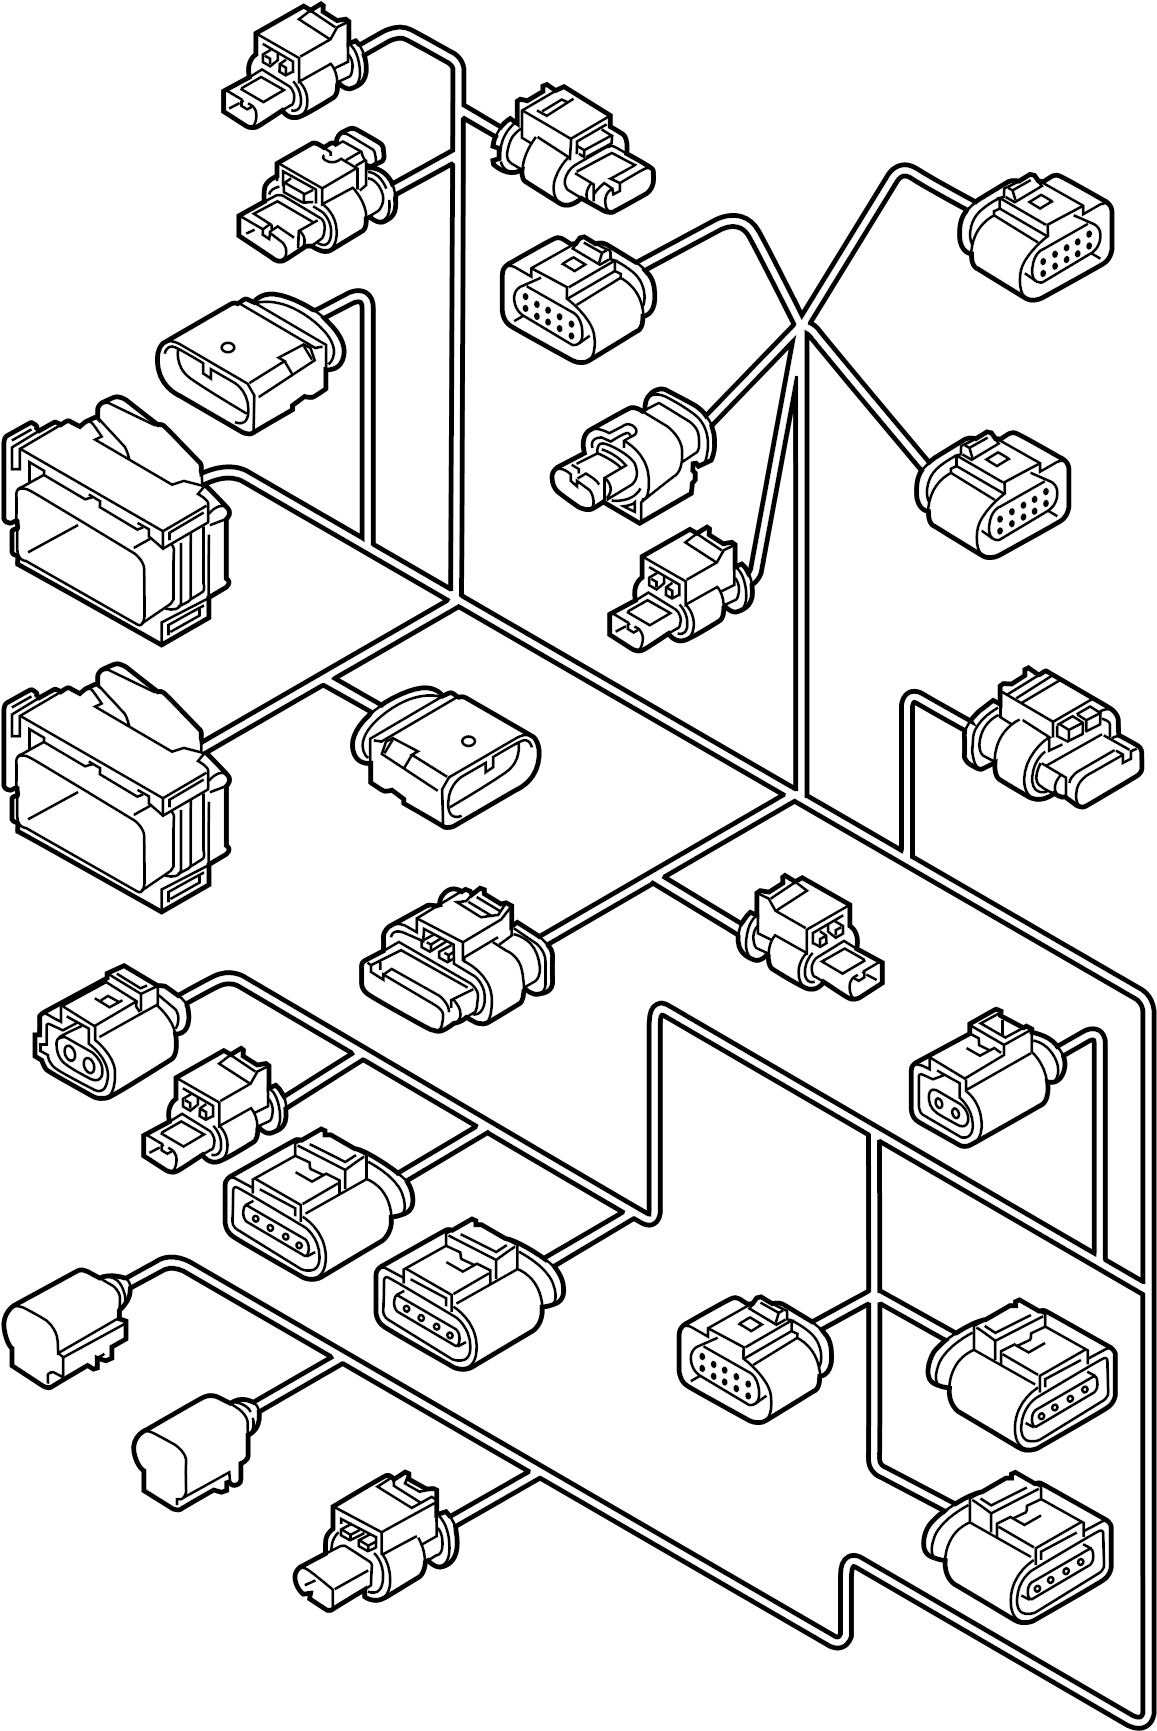 06k971627ab - Engine Wiring Harness  Liter  Trans  Manual